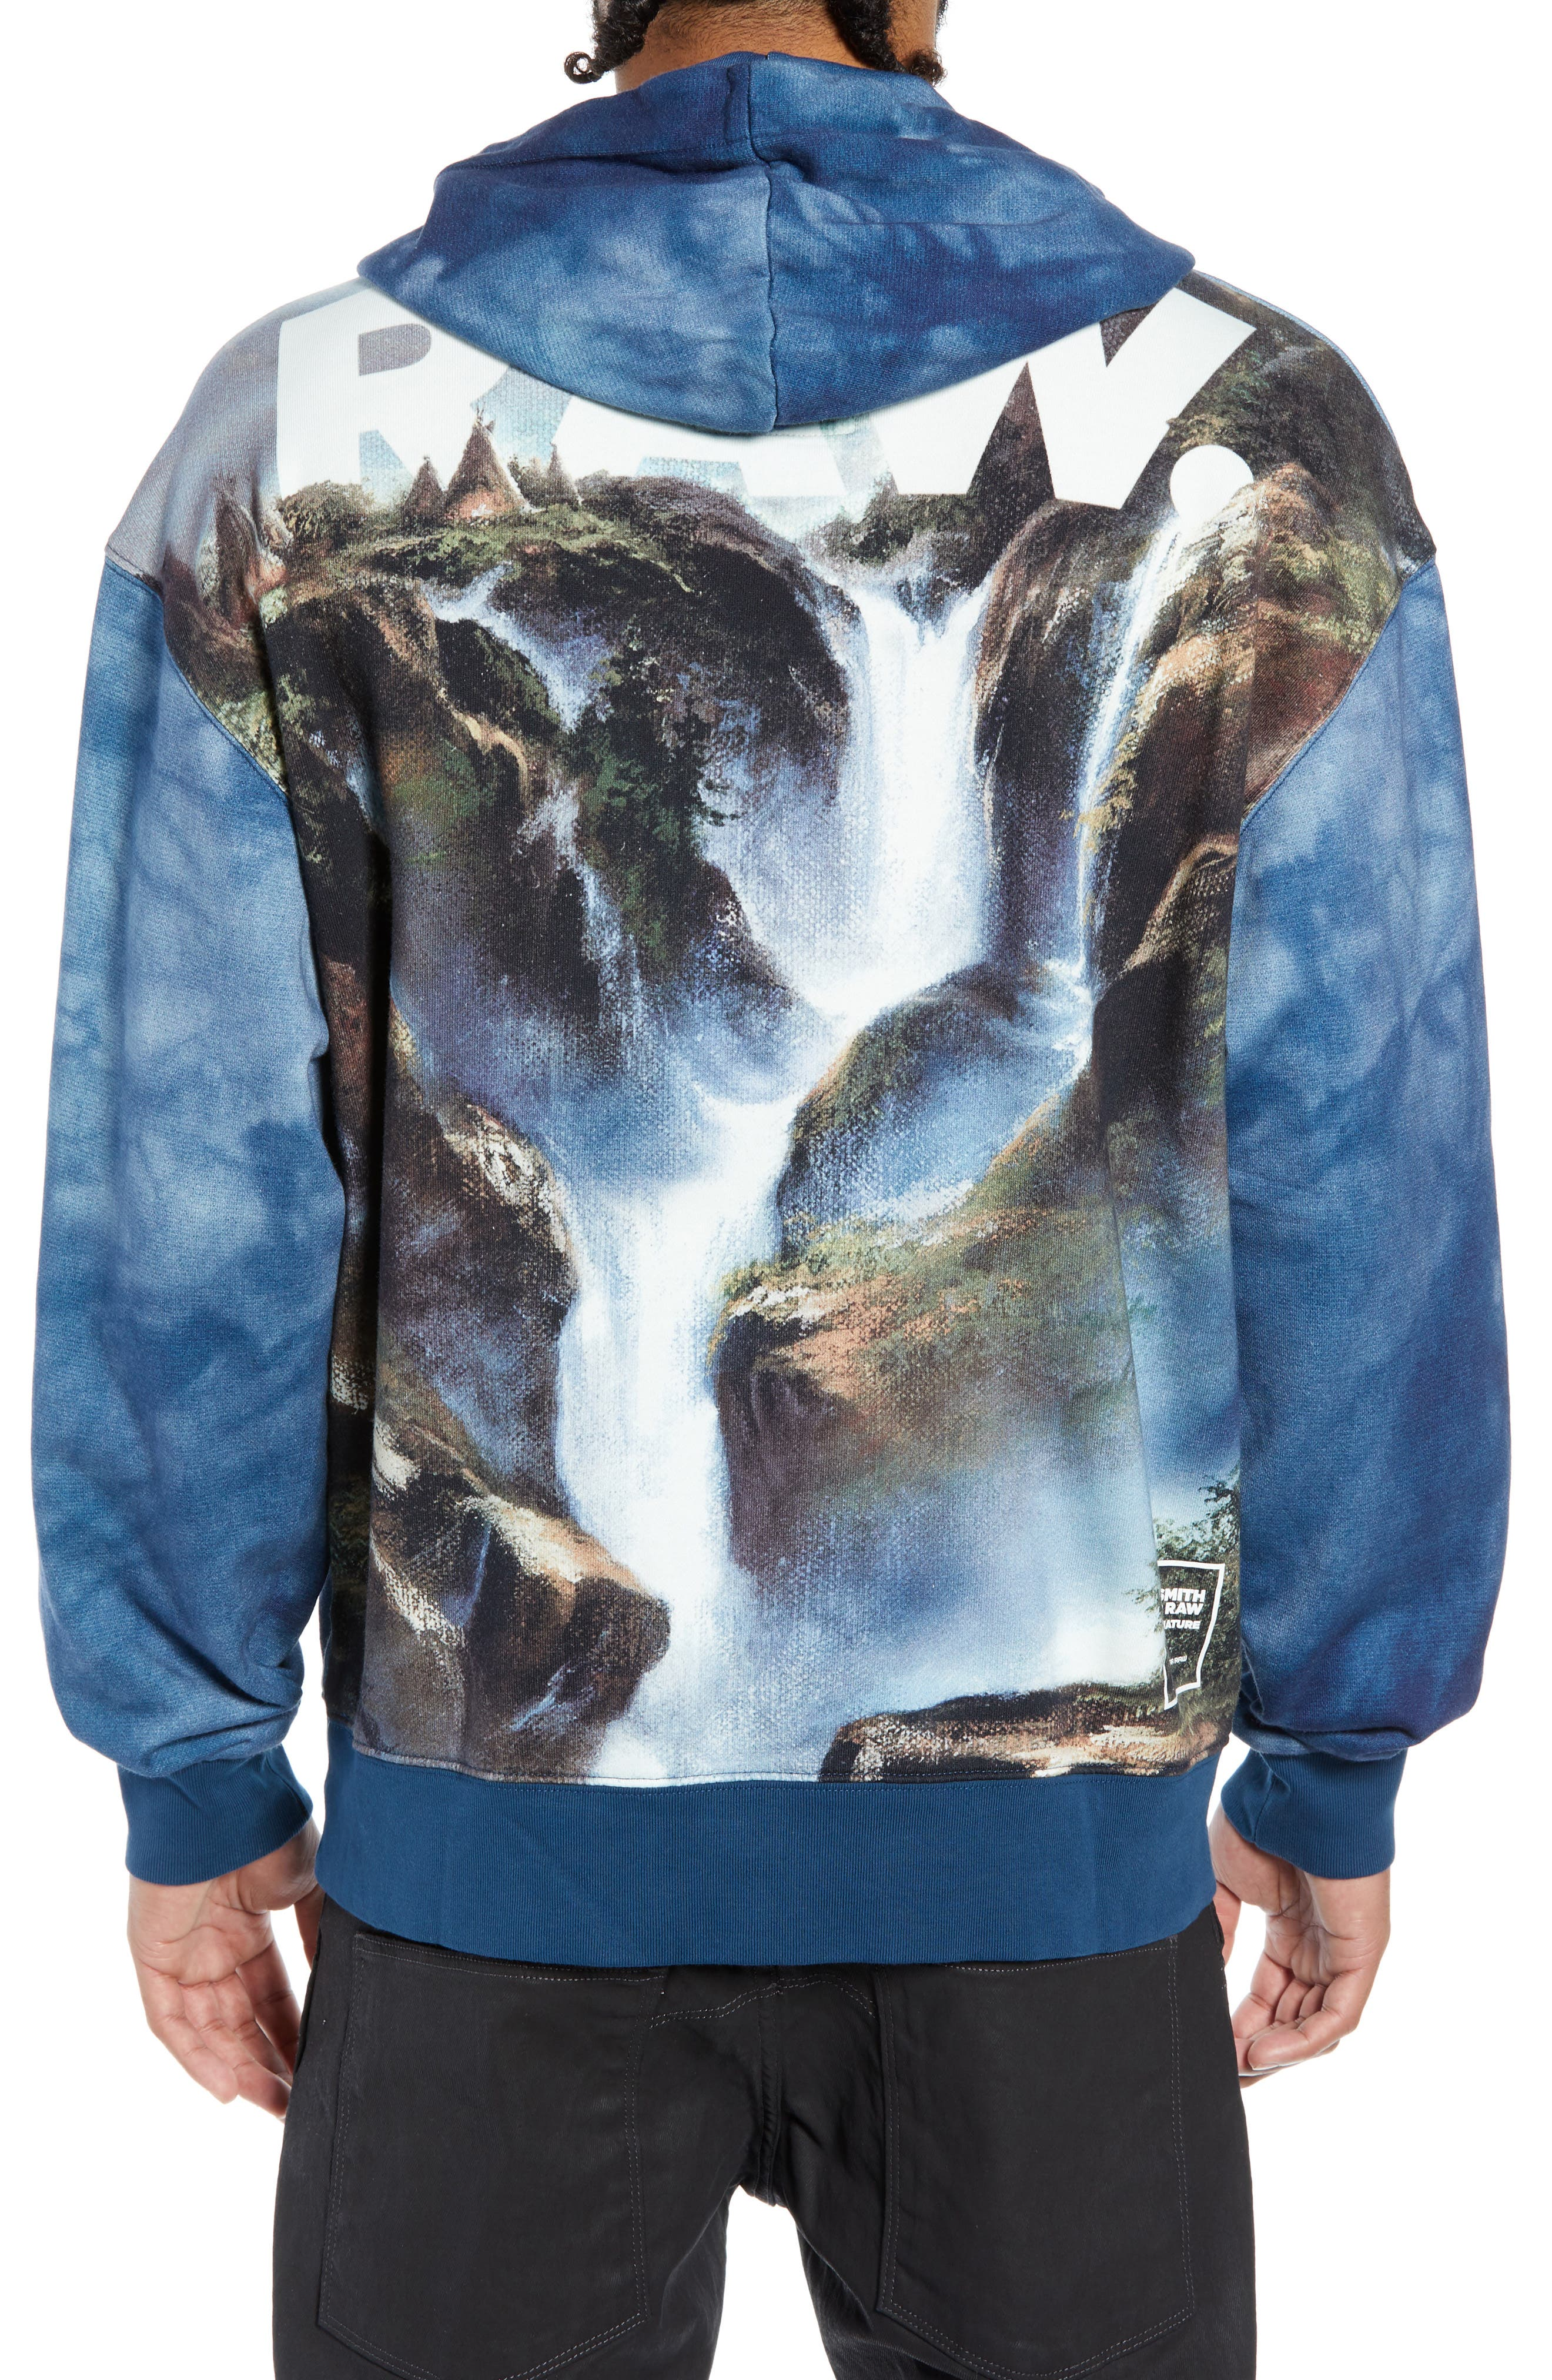 Cryrer Waterfall Hooded Sweatshirt,                             Alternate thumbnail 2, color,                             TEAL BLUE